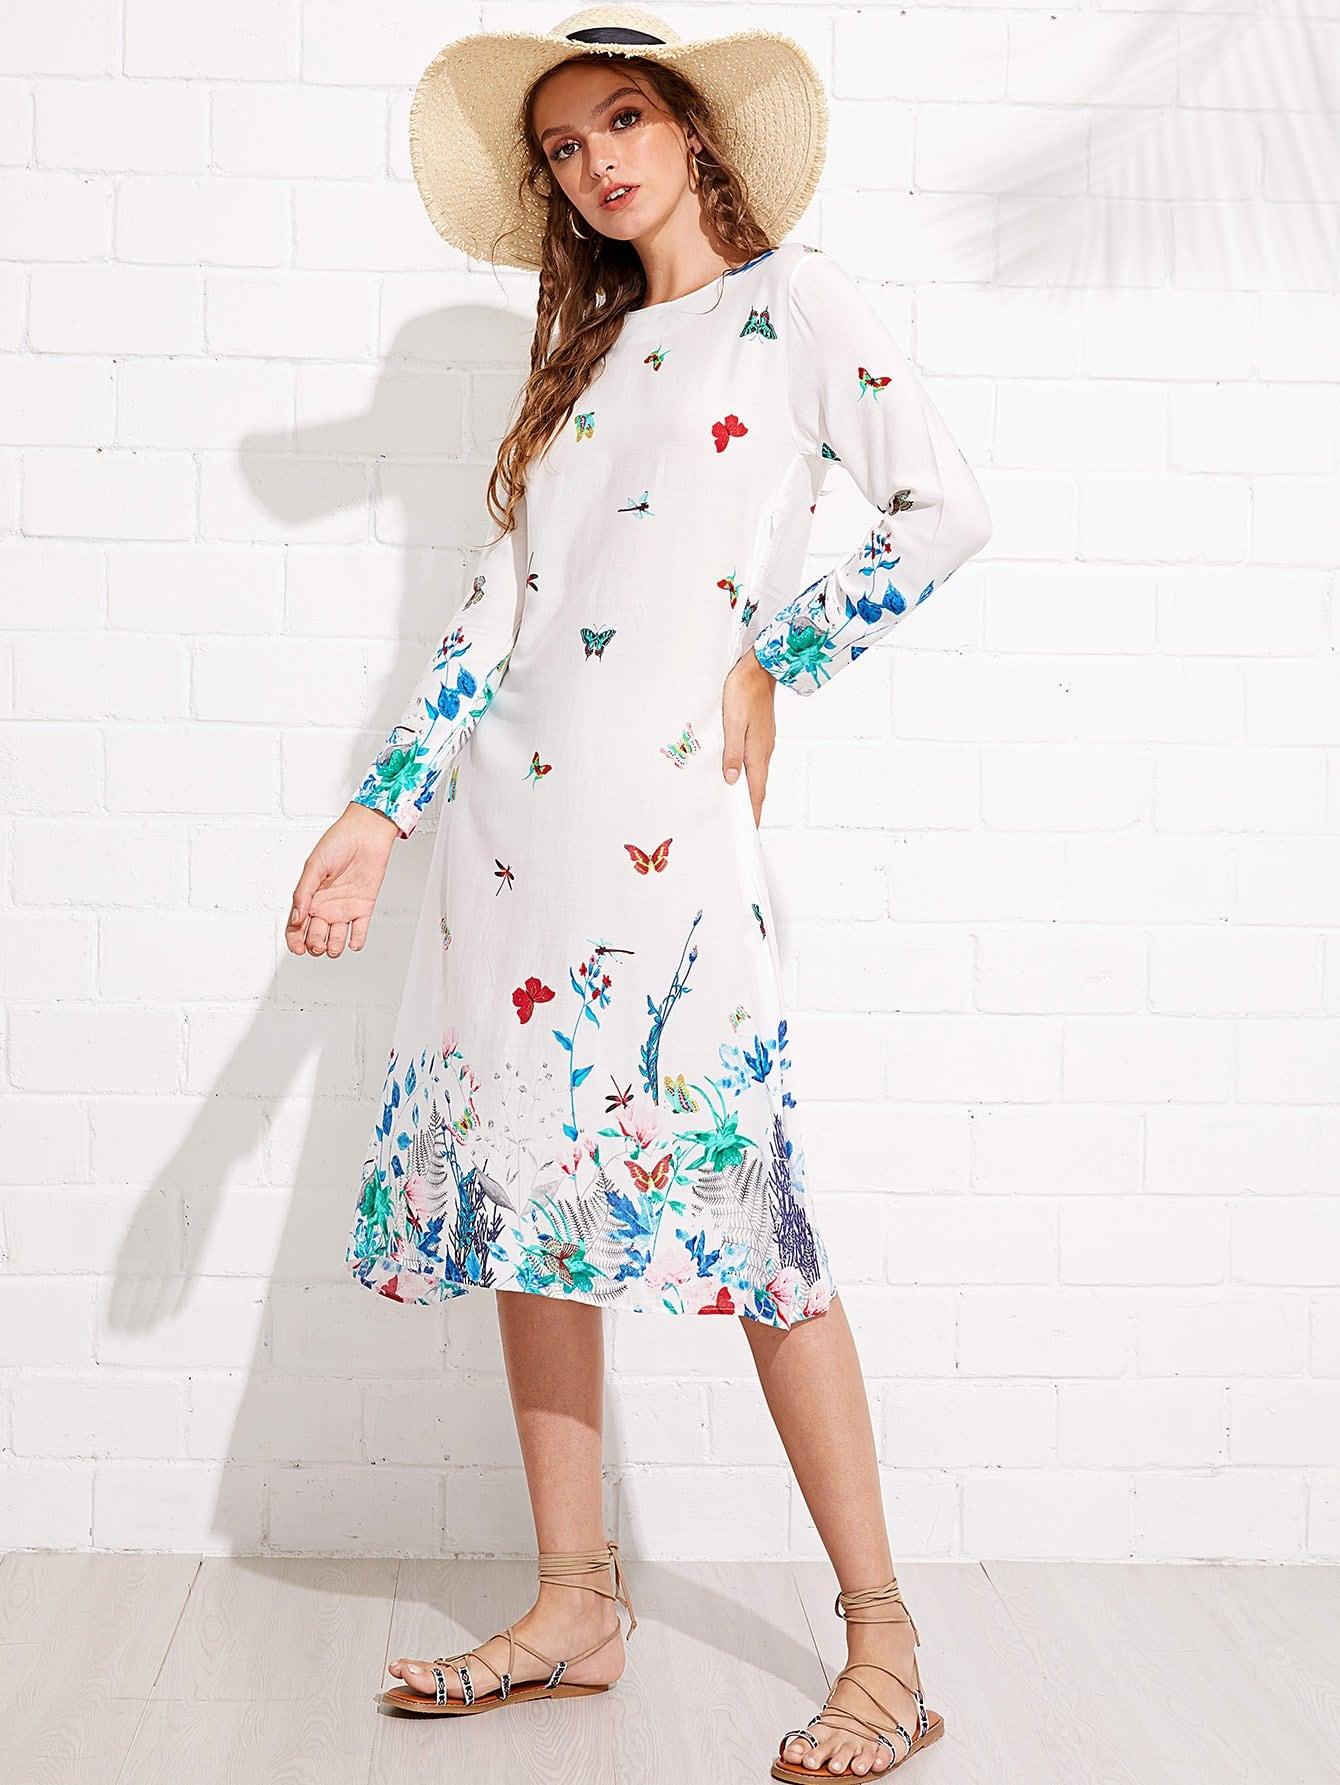 Graphic Print Zip Up Side Dress zip up side plaid dress